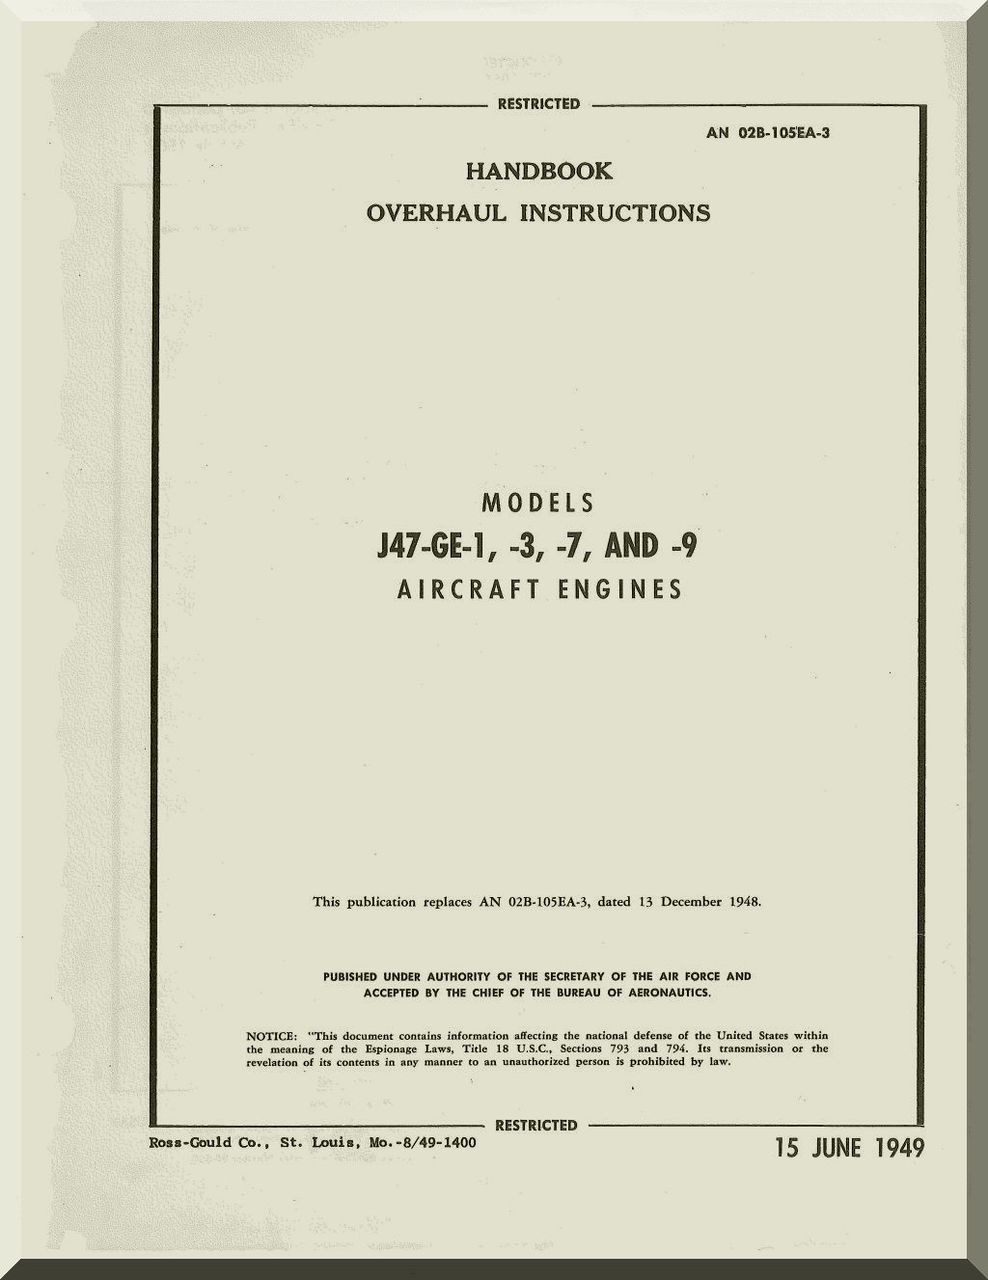 General Electric J47 -1-3-7-9 Aircraft Jet Engine Overhaul Manual ( English  Language ) -1959 - AN 02B-105EA-3